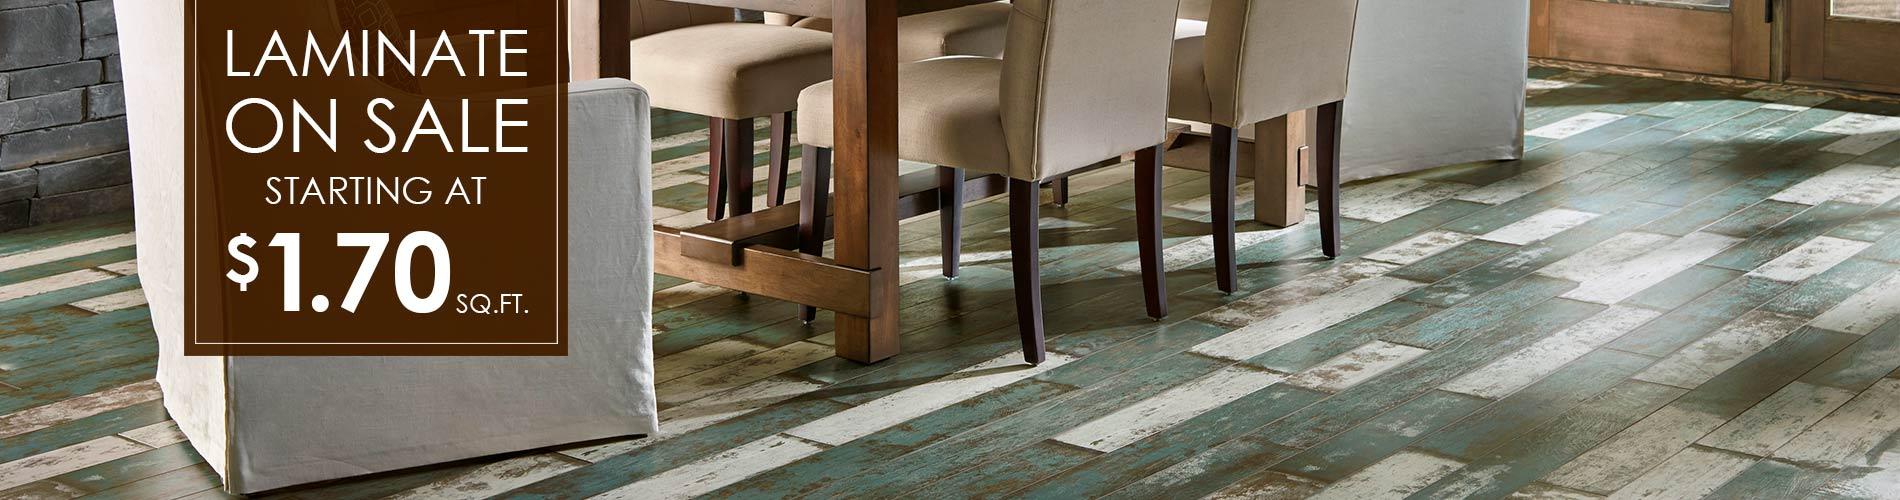 Abbey Carpet Amp Floor San Mateo Ca 94401 Menlo Park